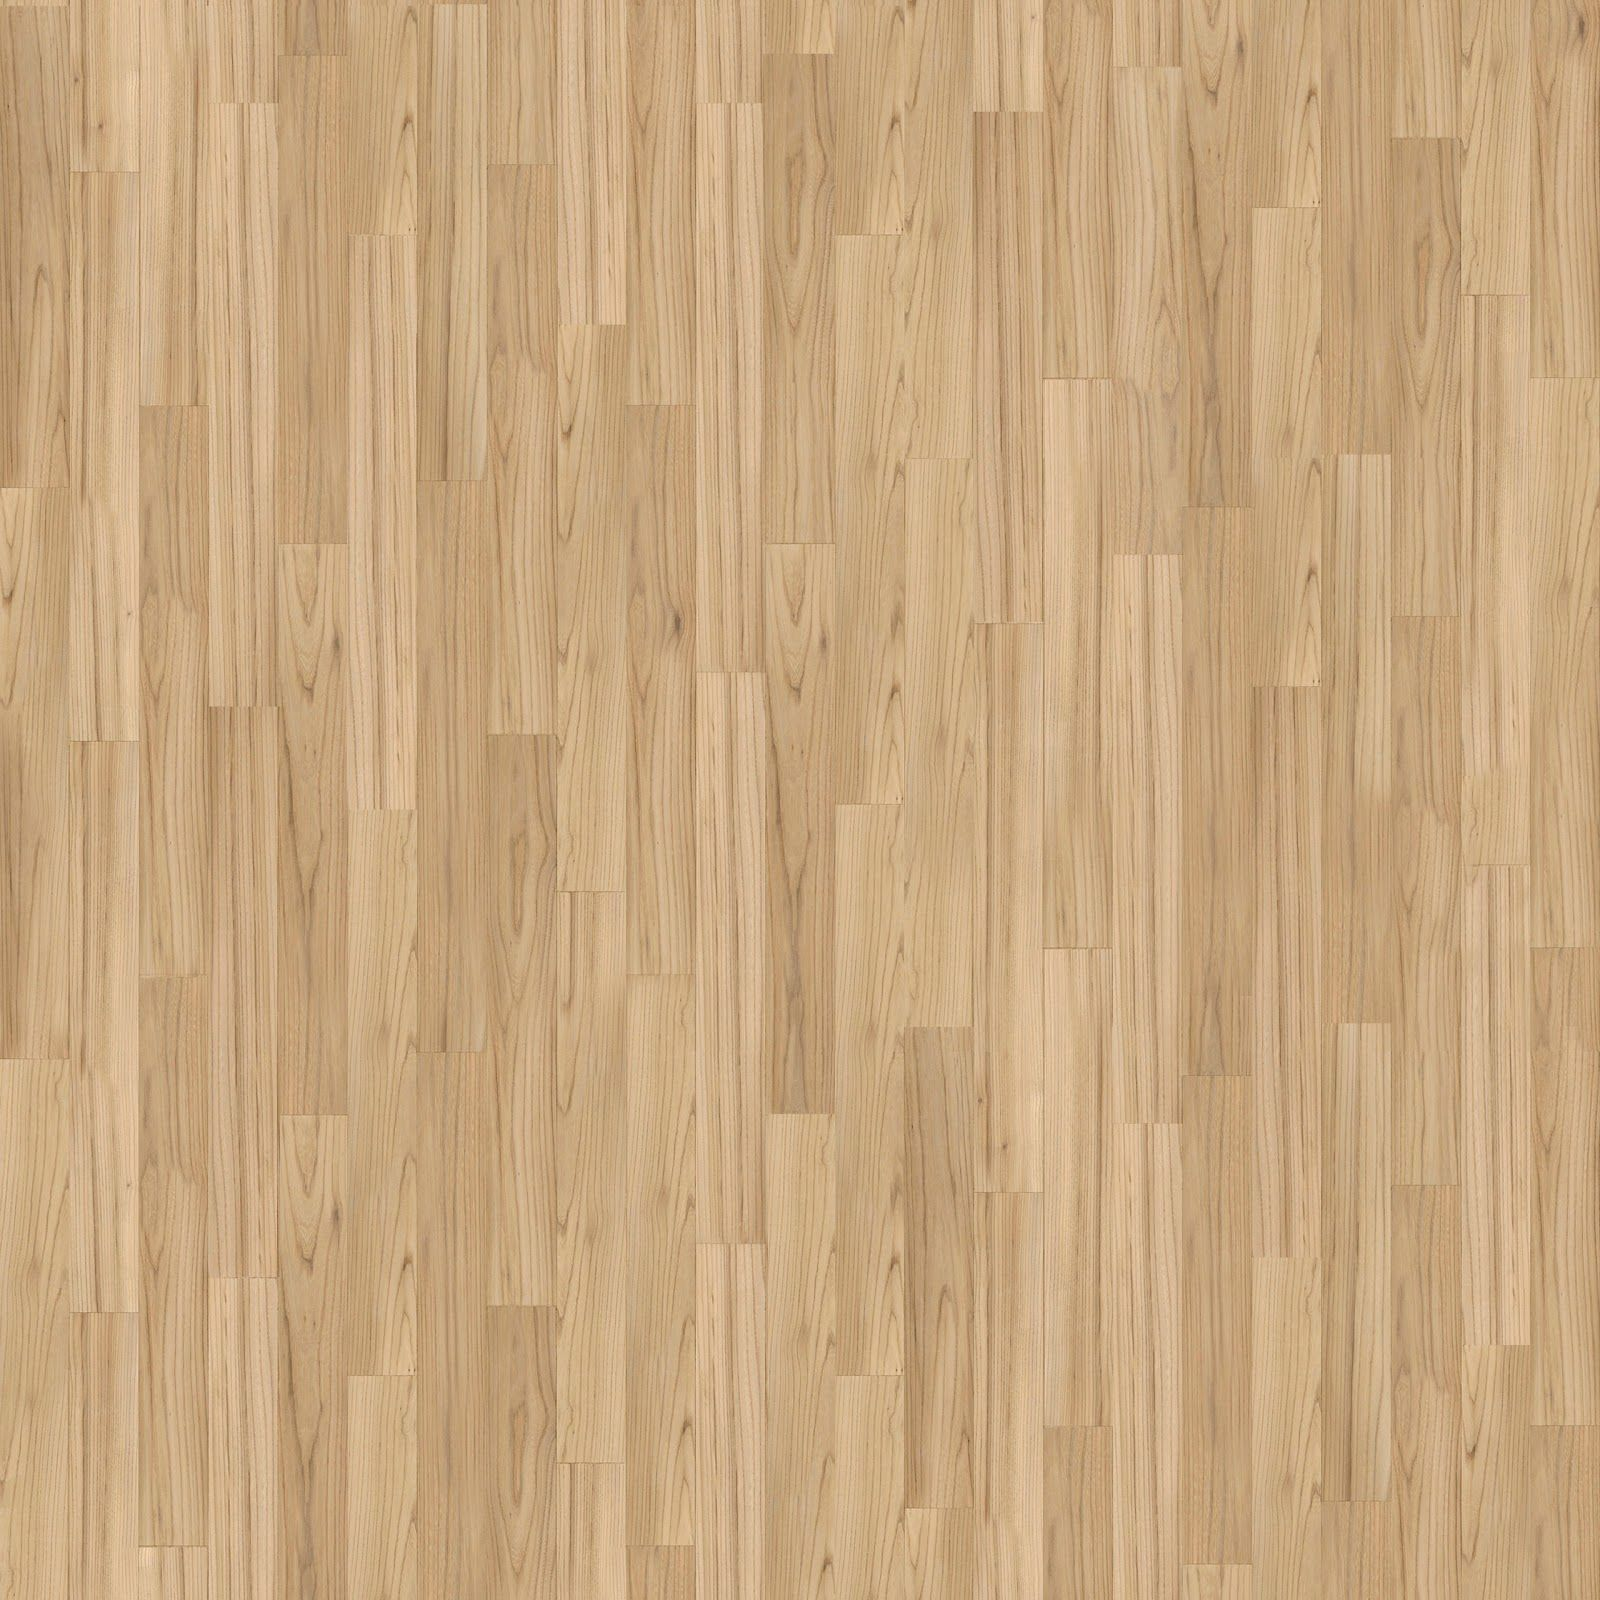 Simo 3d Blogspot Com Texture Seamless Parquet Rovere Legno